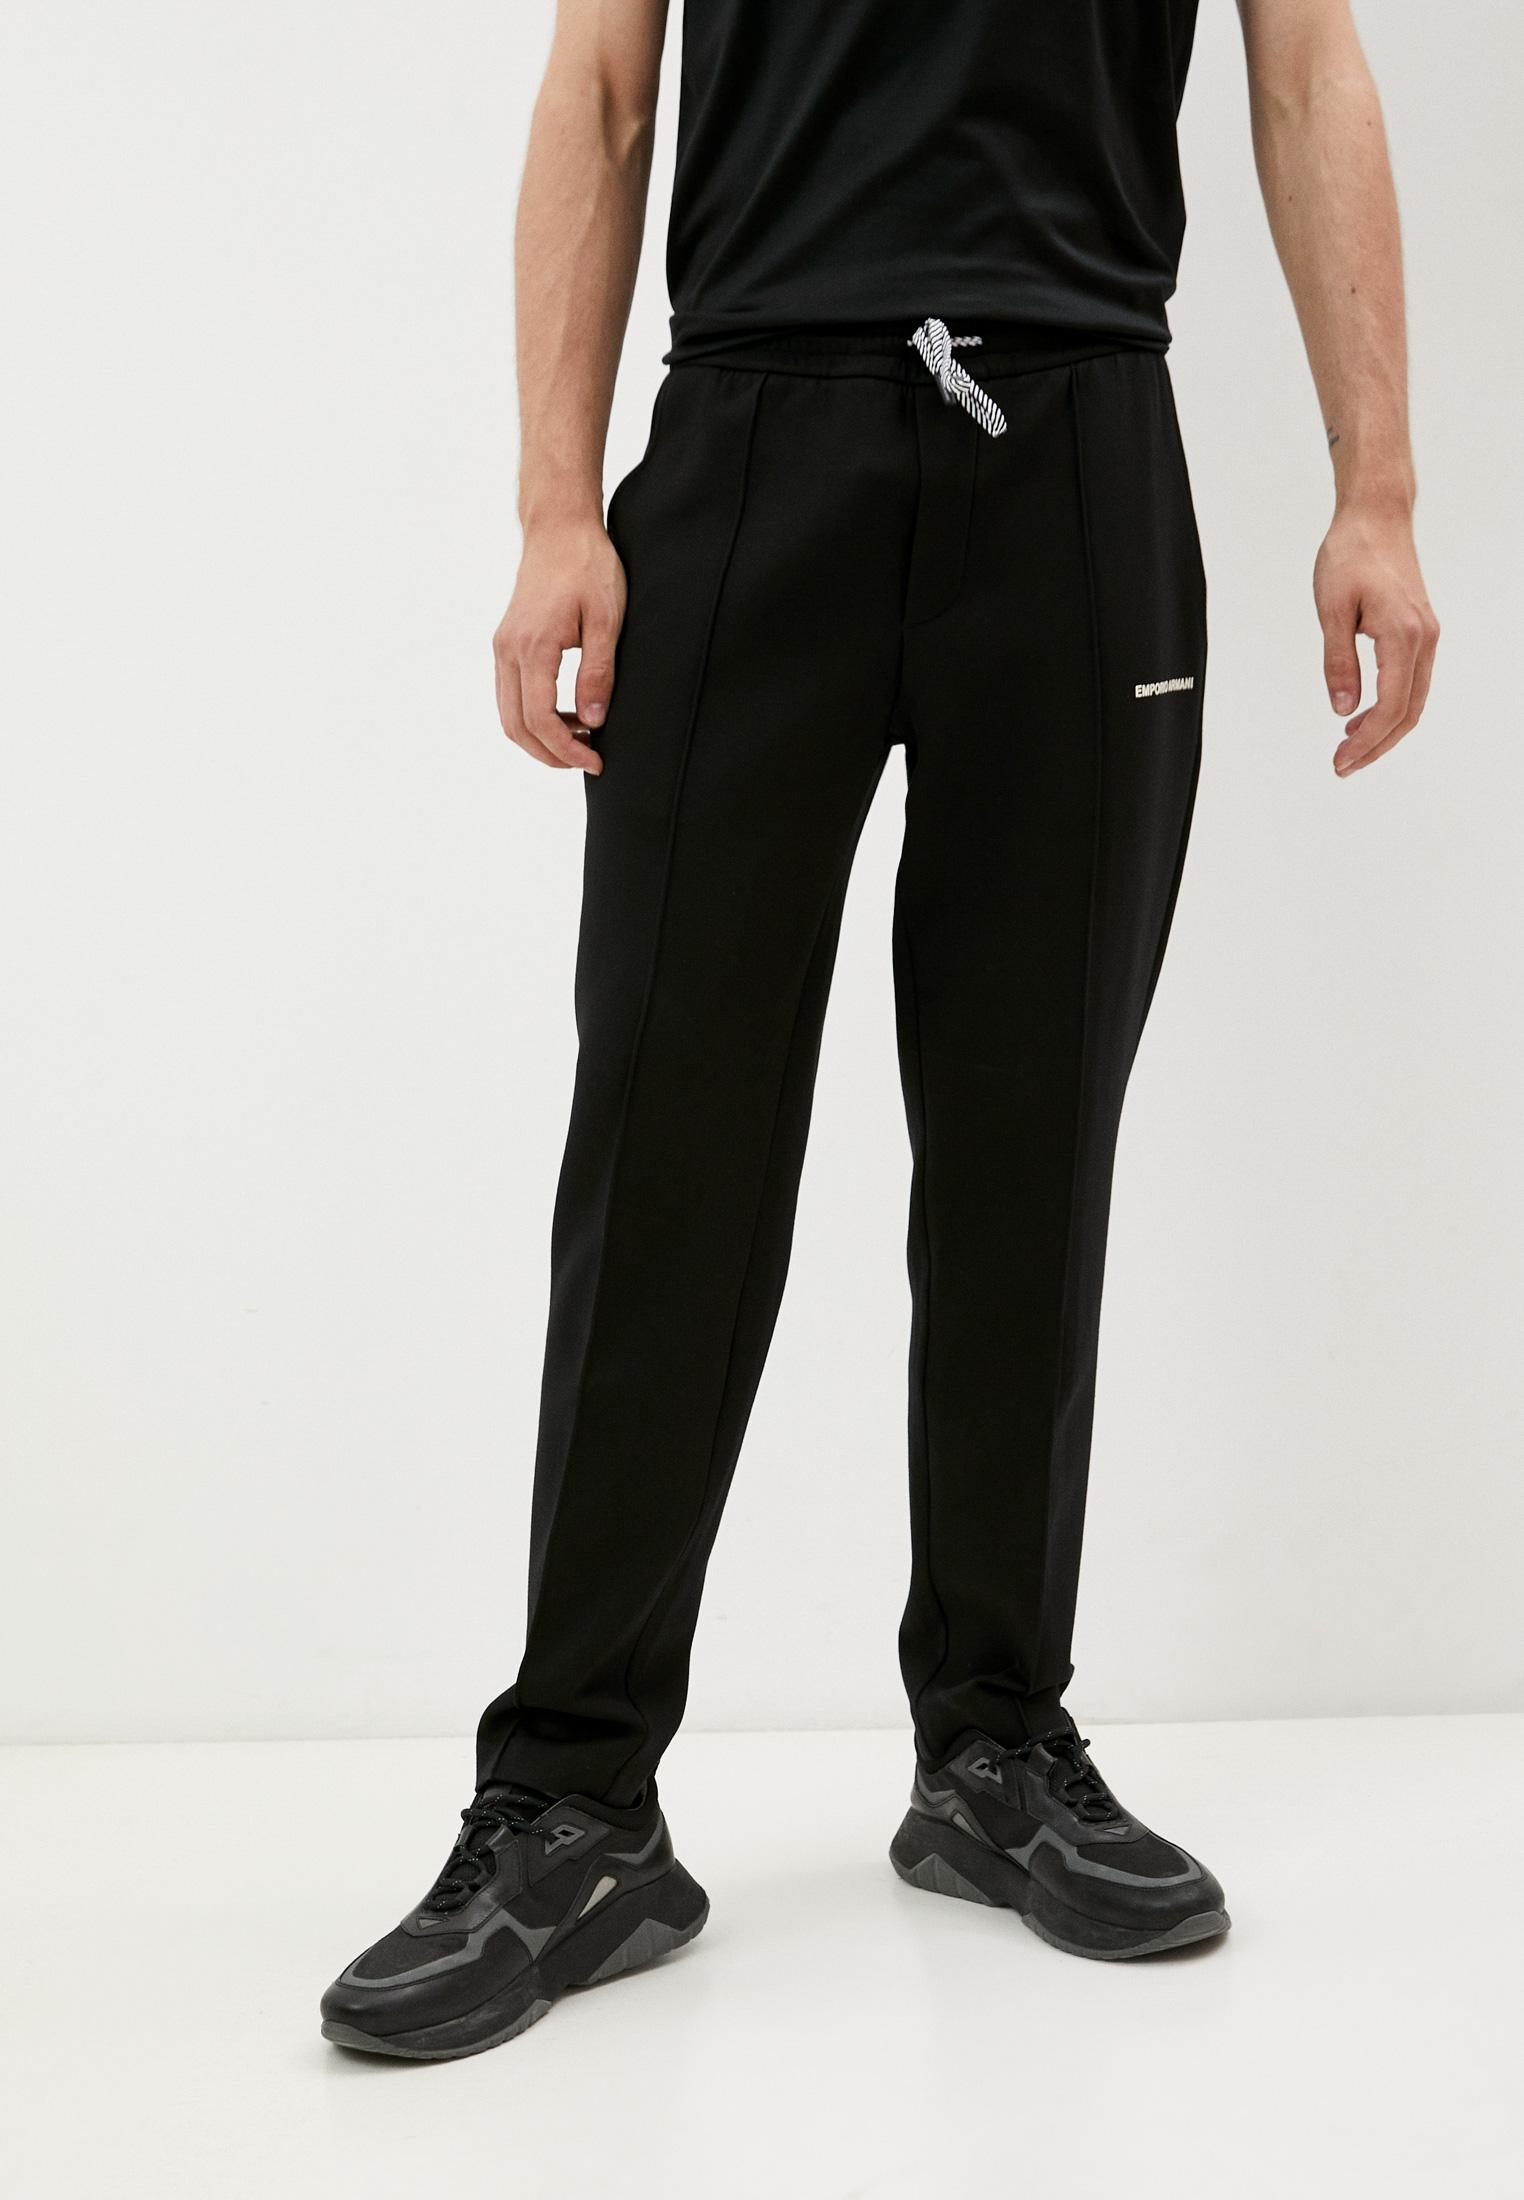 Мужские спортивные брюки Emporio Armani (Эмпорио Армани) 6K1P67 1JHSZ